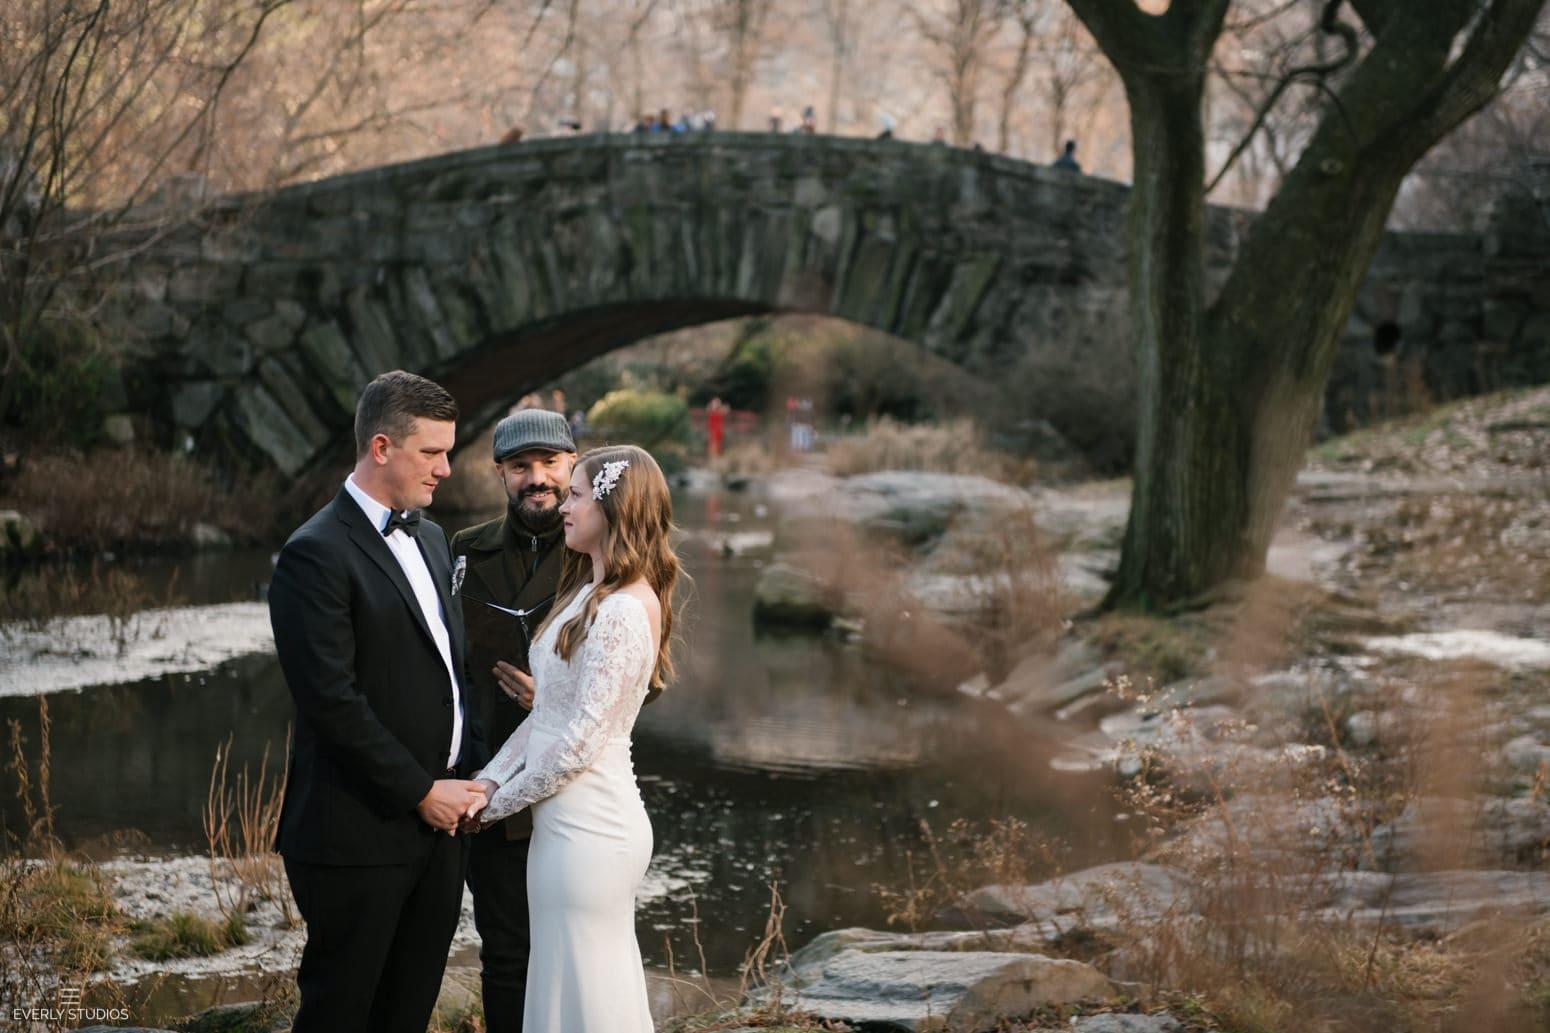 Gapstow Bridge elopement in Central Park NYC. Winter Central Park wedding at Gapstow Bridge in New York. Photo by Central Park wedding photographer Everly Studios, www.everlystudios.com